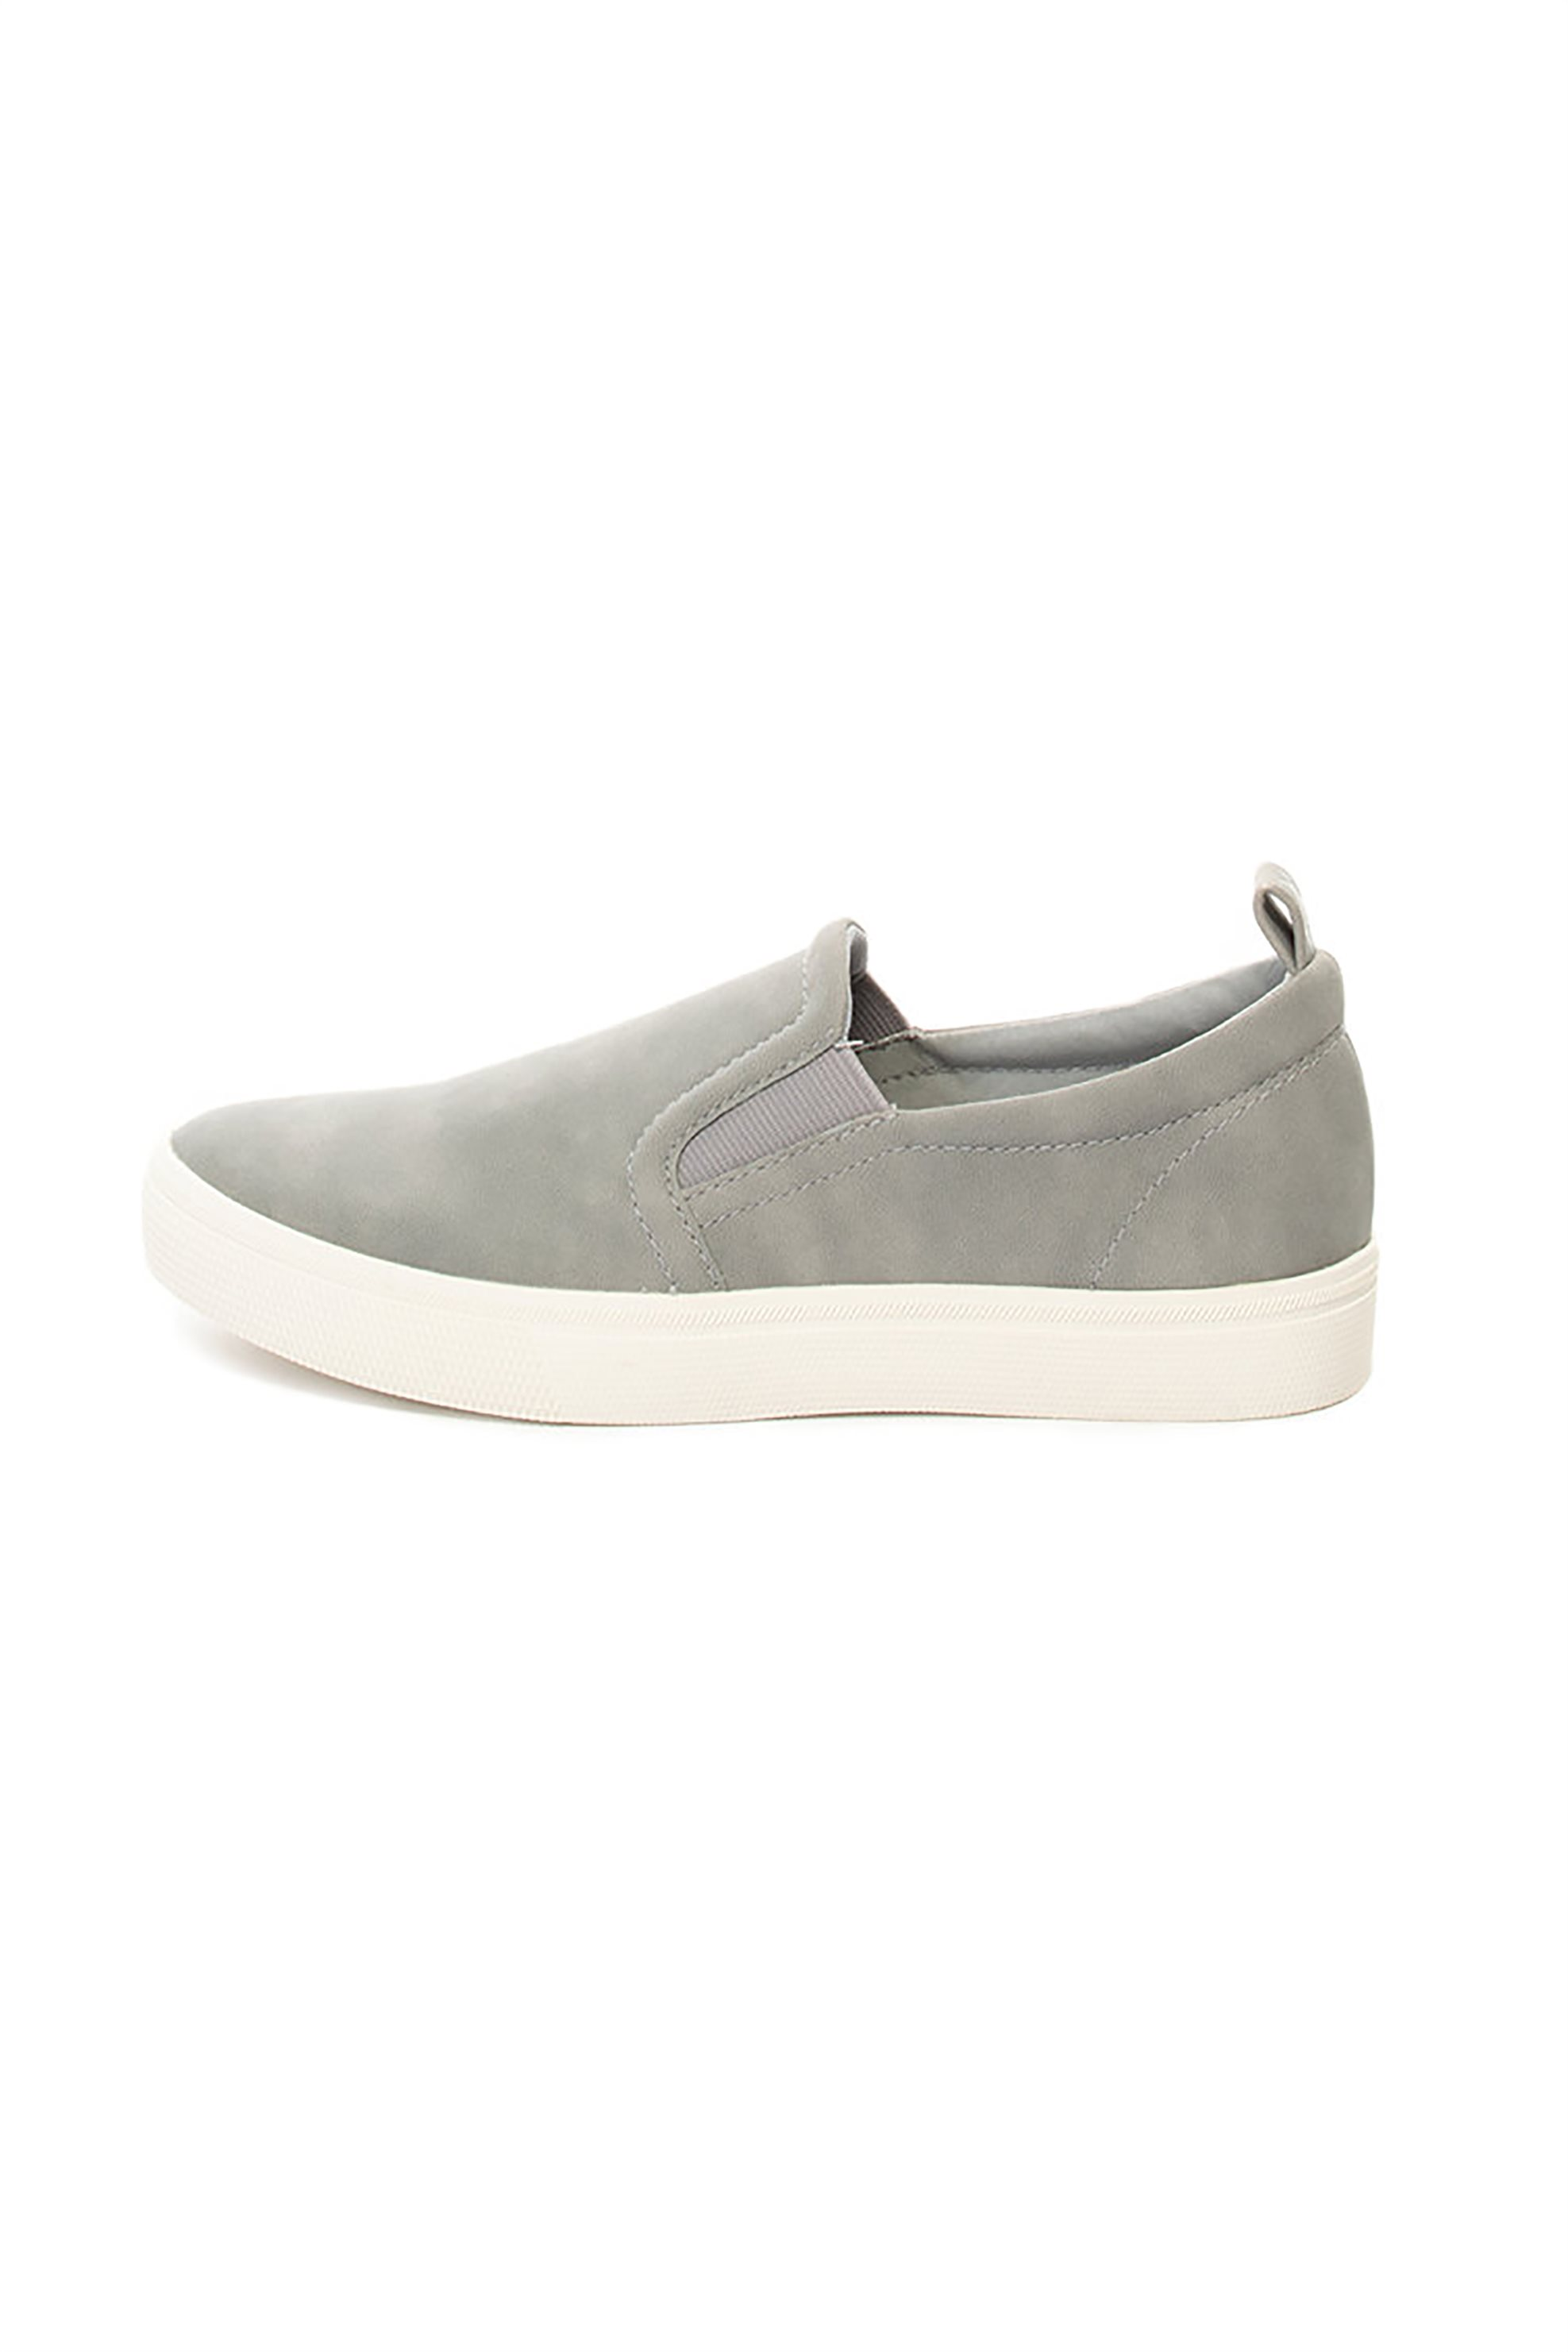 Esprit γυναικεία παπούτσια slip-on suede – 029EK1W011 – Γκρι